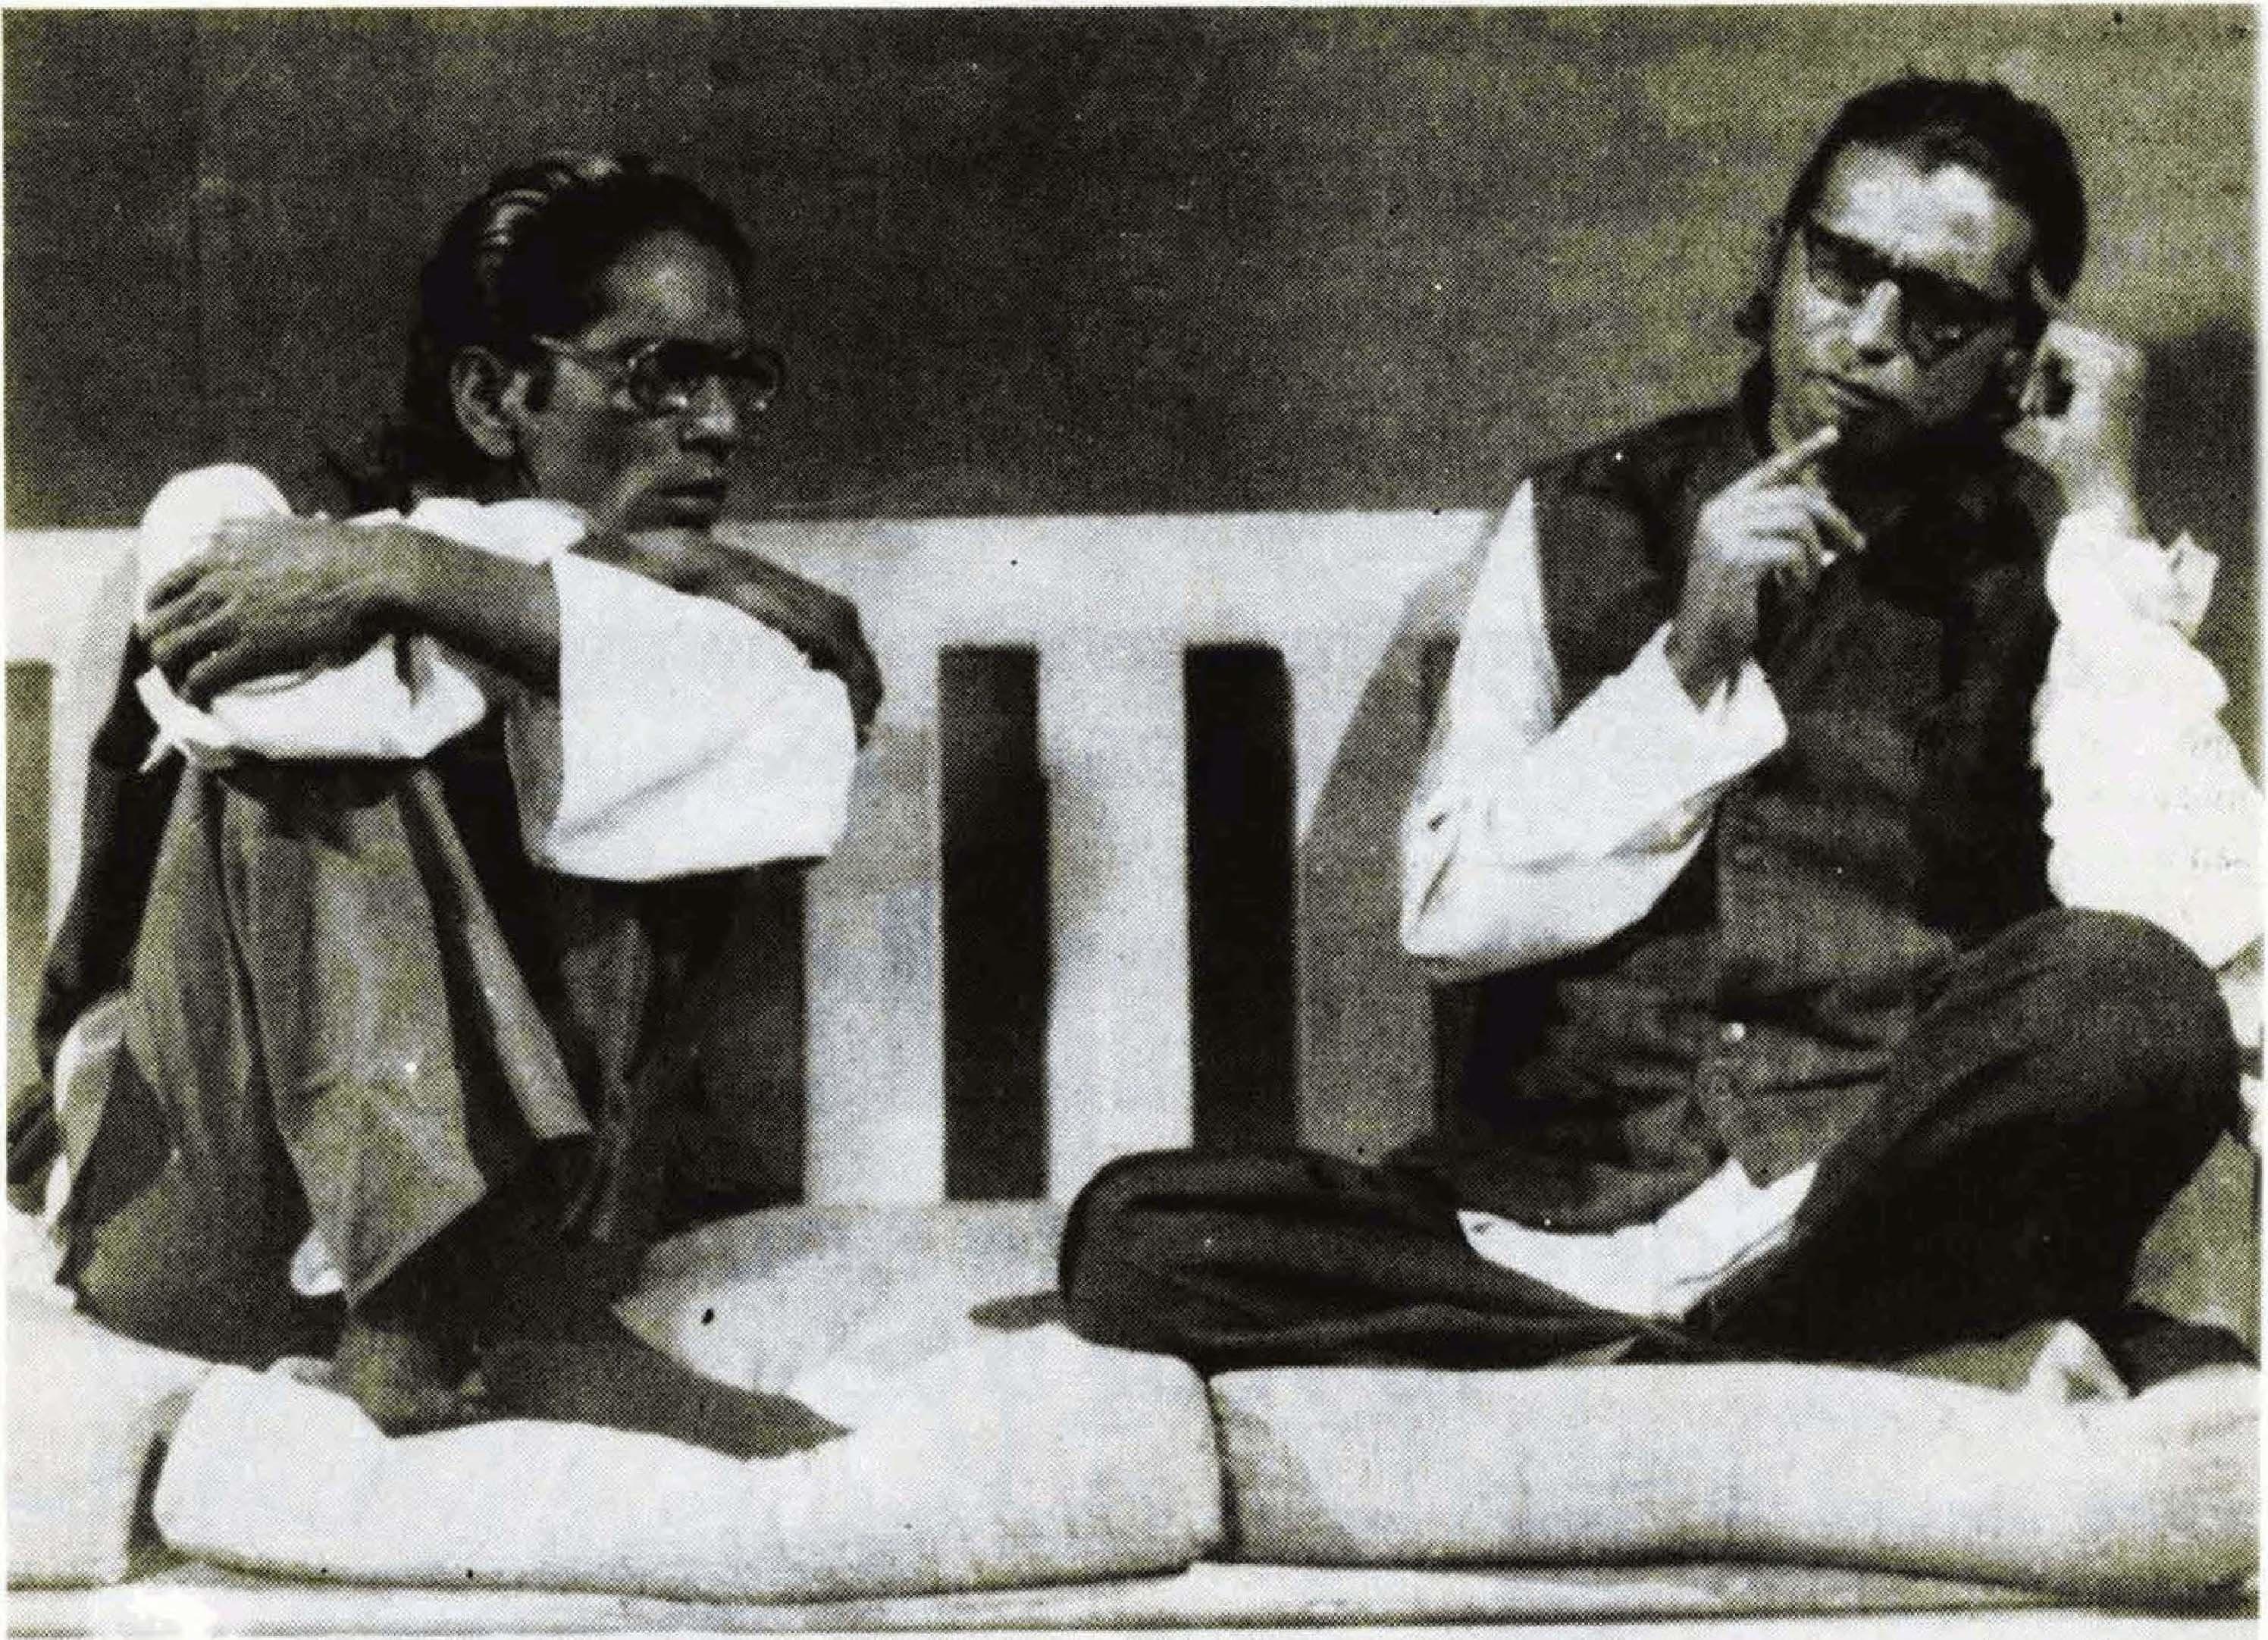 Majid Jehangir and Ismail Tara | Photo by Ahmad Ali